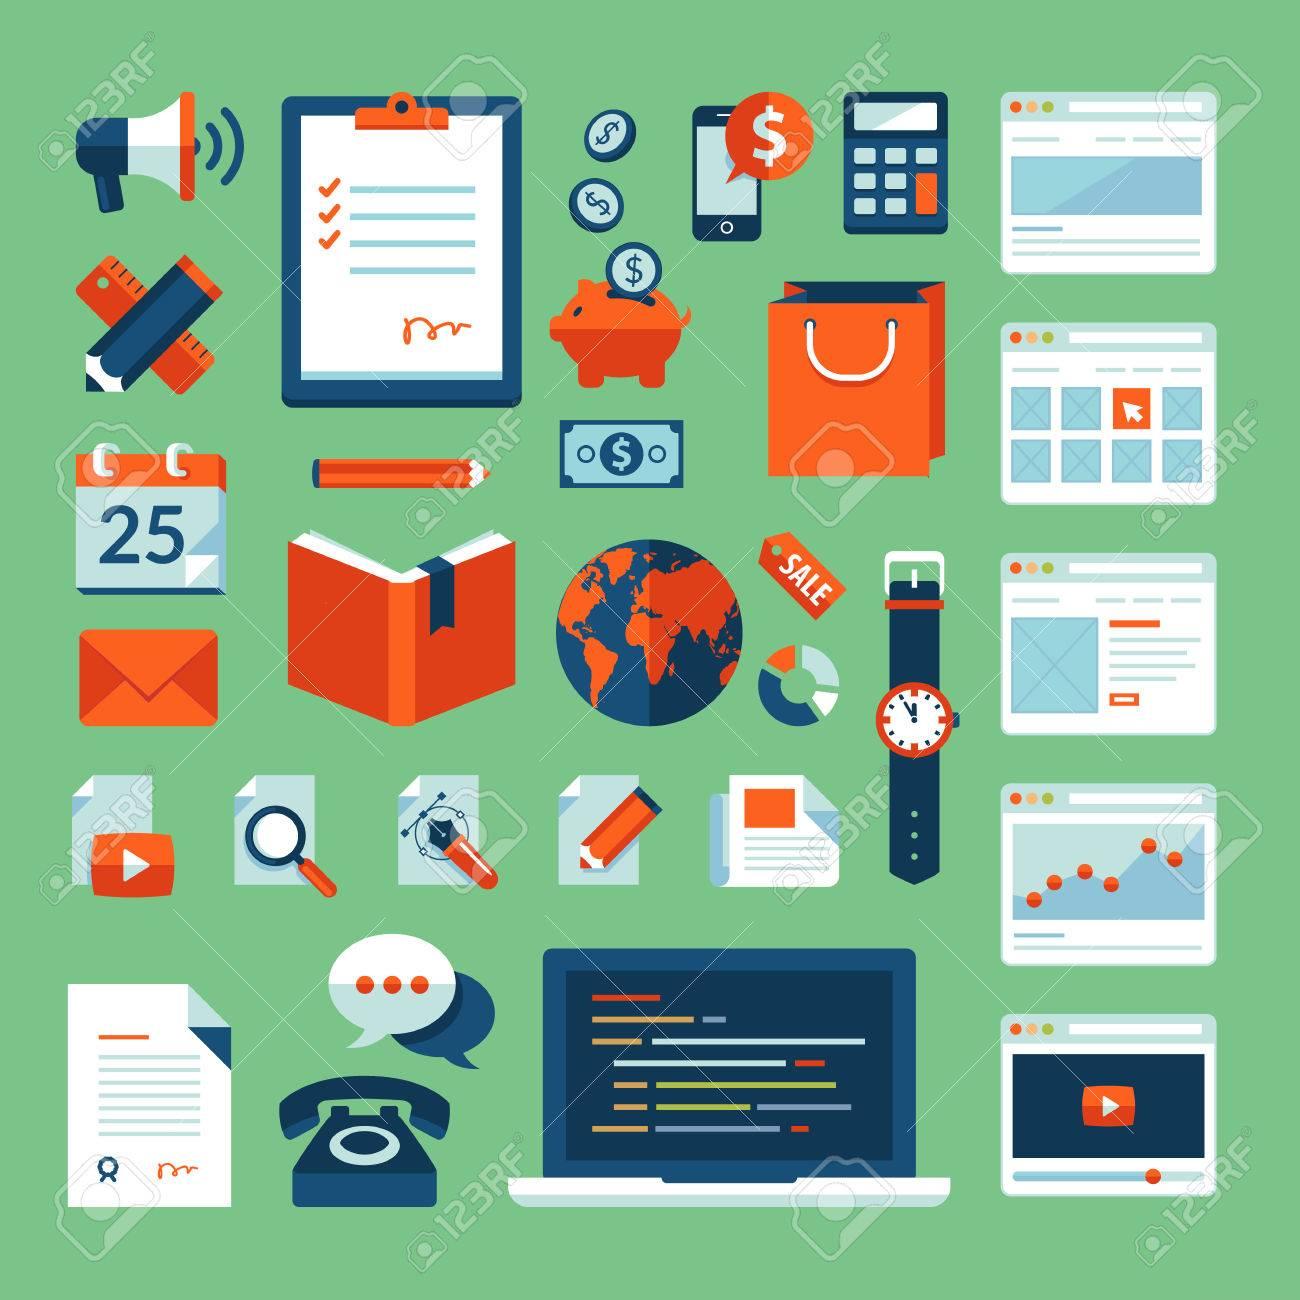 Flat design vector illustration concept icons set of business working elements for web design, e-commerce, mobile app, digital marketing, programming, seo, office, communication, finance Stock Vector - 24900096